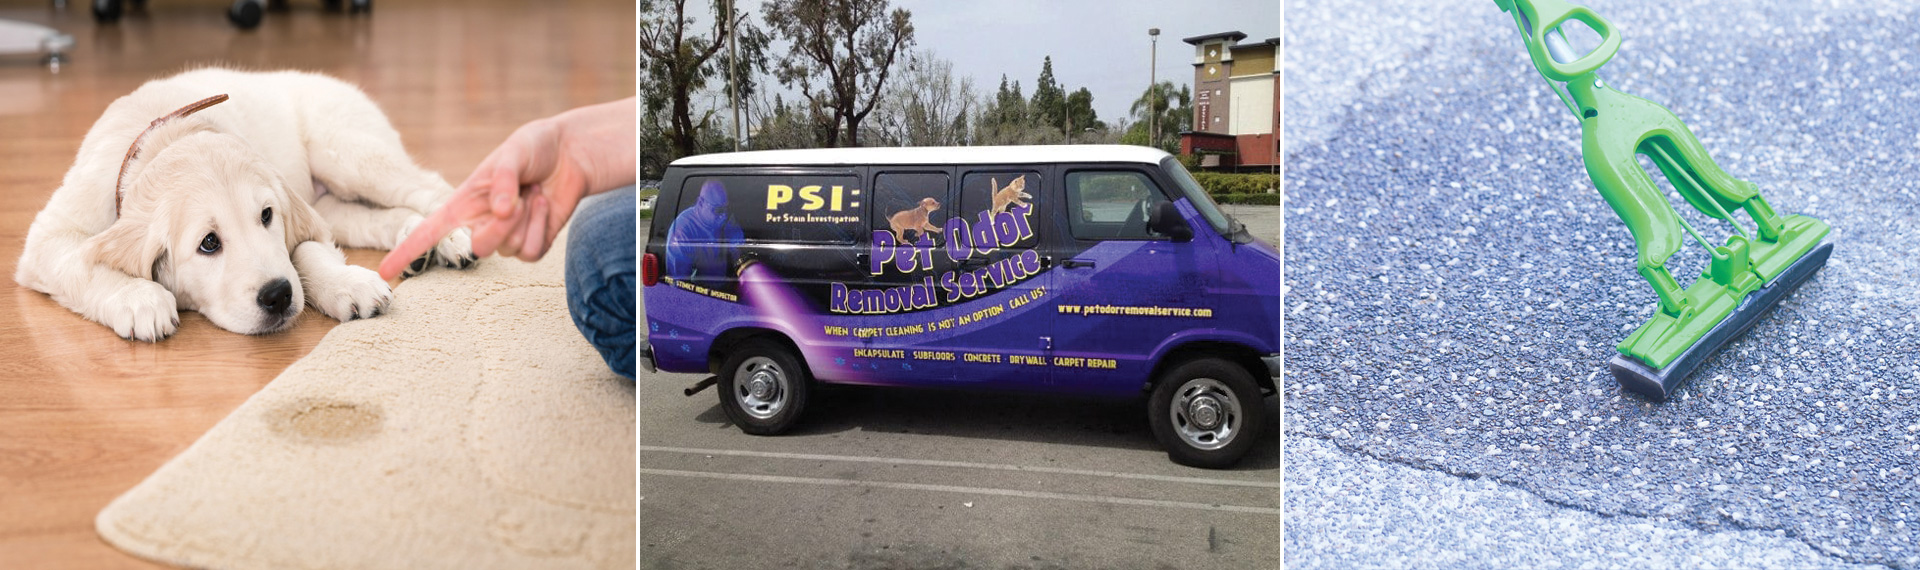 Pet Odor Removal Service Huntington Beach CA